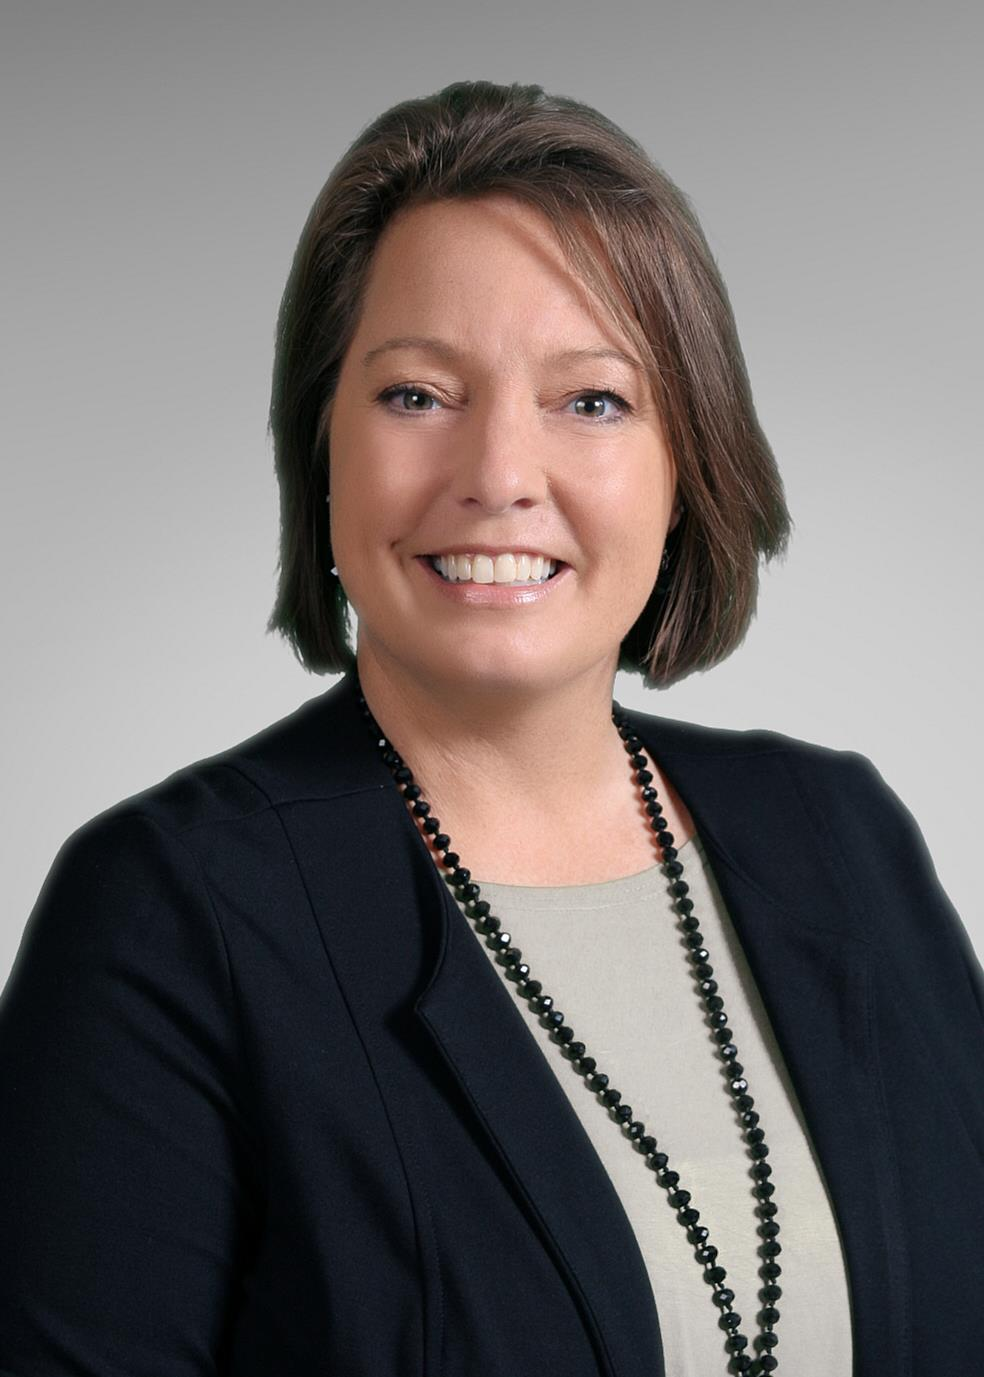 Carol Smith, Principal